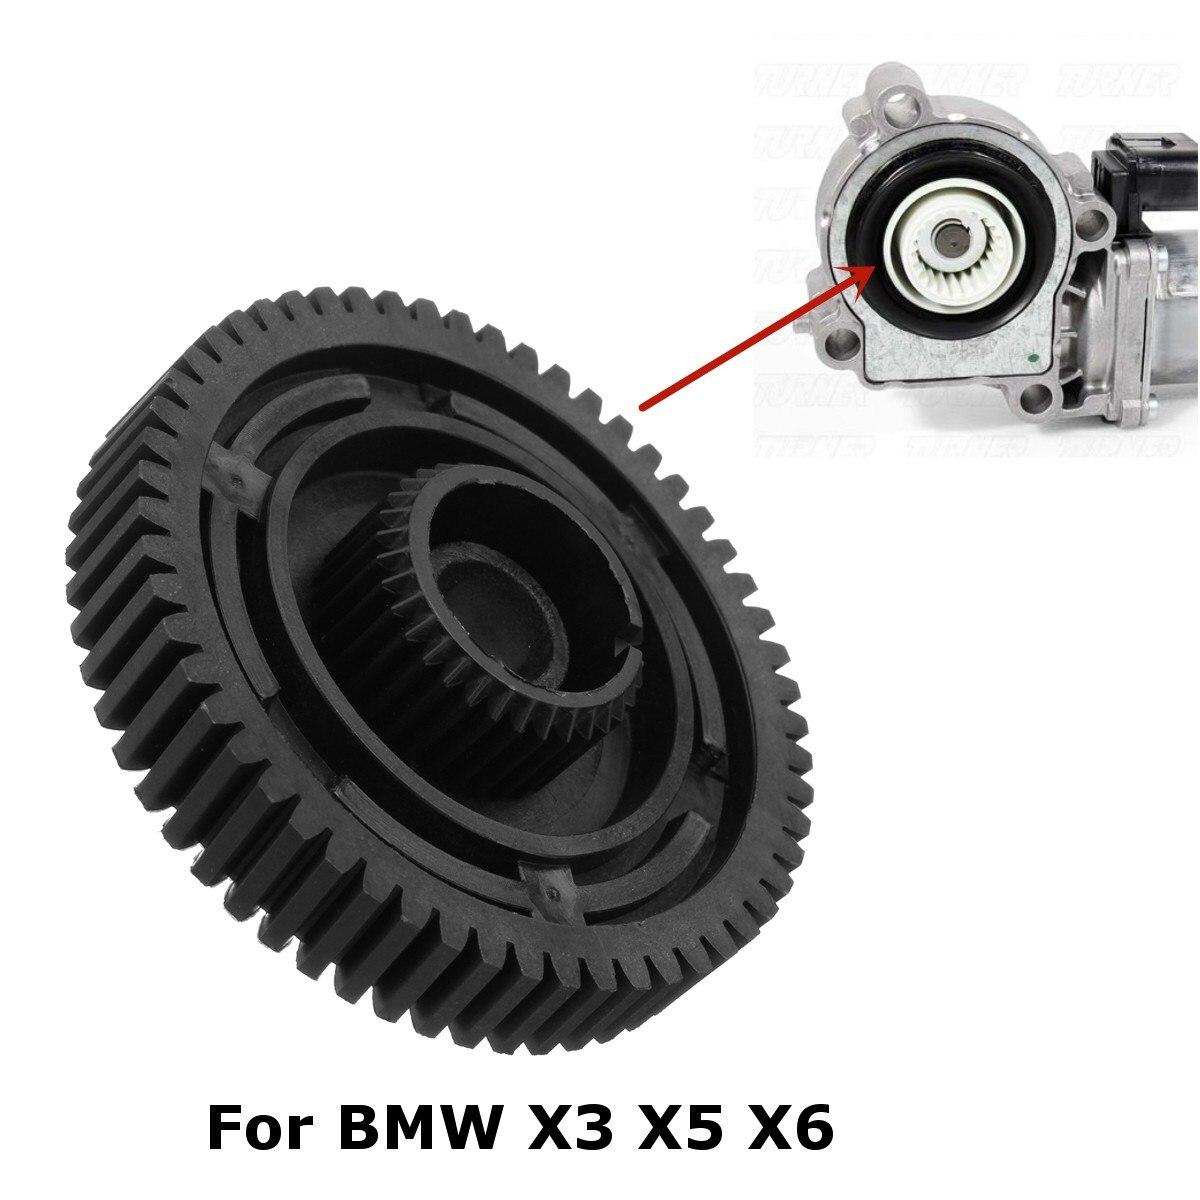 Auto Transfer Fall Antrieb Motor Reparatur Getriebe Servo Für BMW X3 X5 X6 E83 E53 E70 27107566296 8473227771